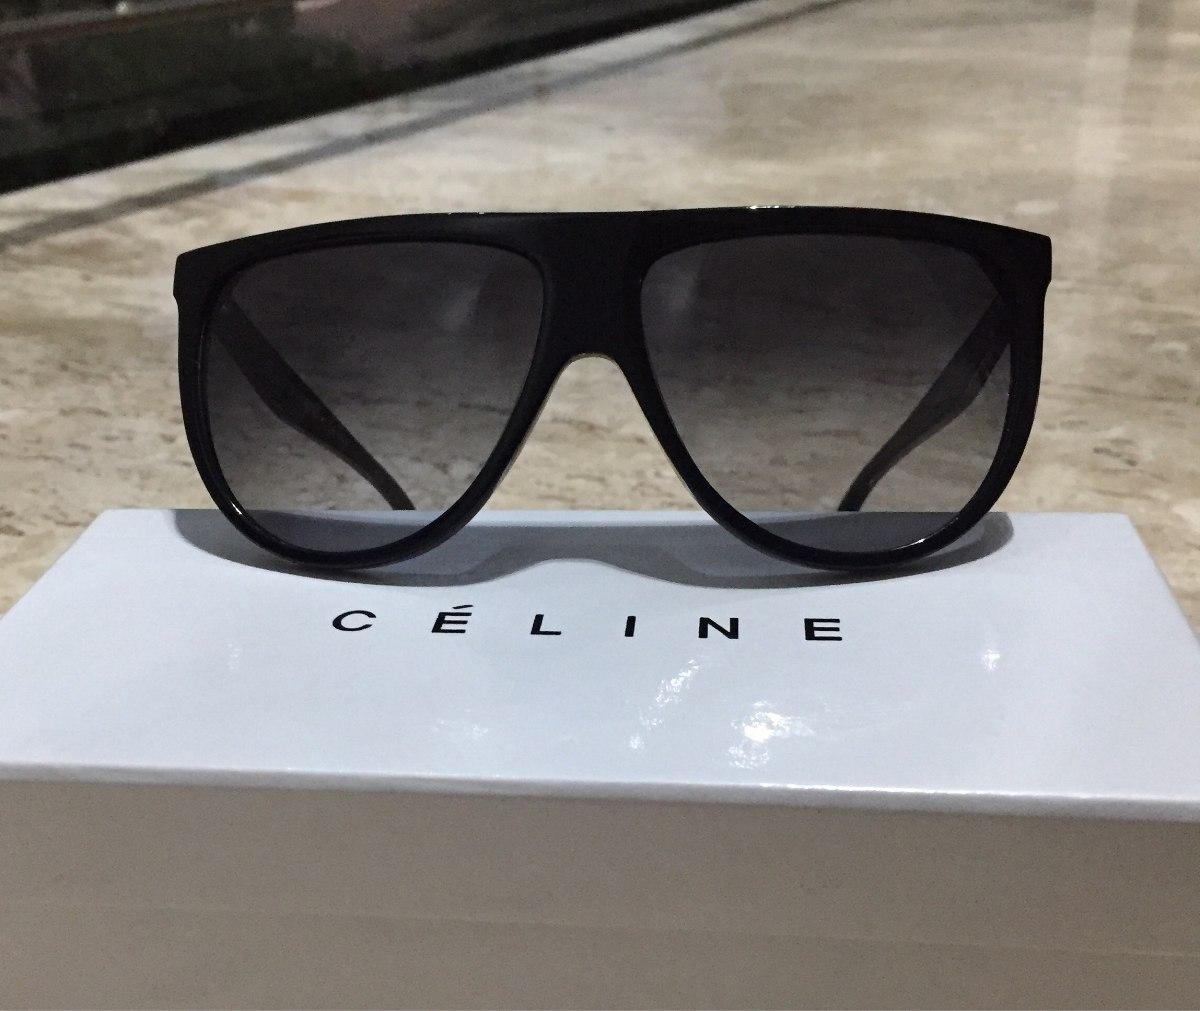 5b419194f4677 Óculos Céline Cl41435 s Thin Shadow - R  619,00 em Mercado Livre